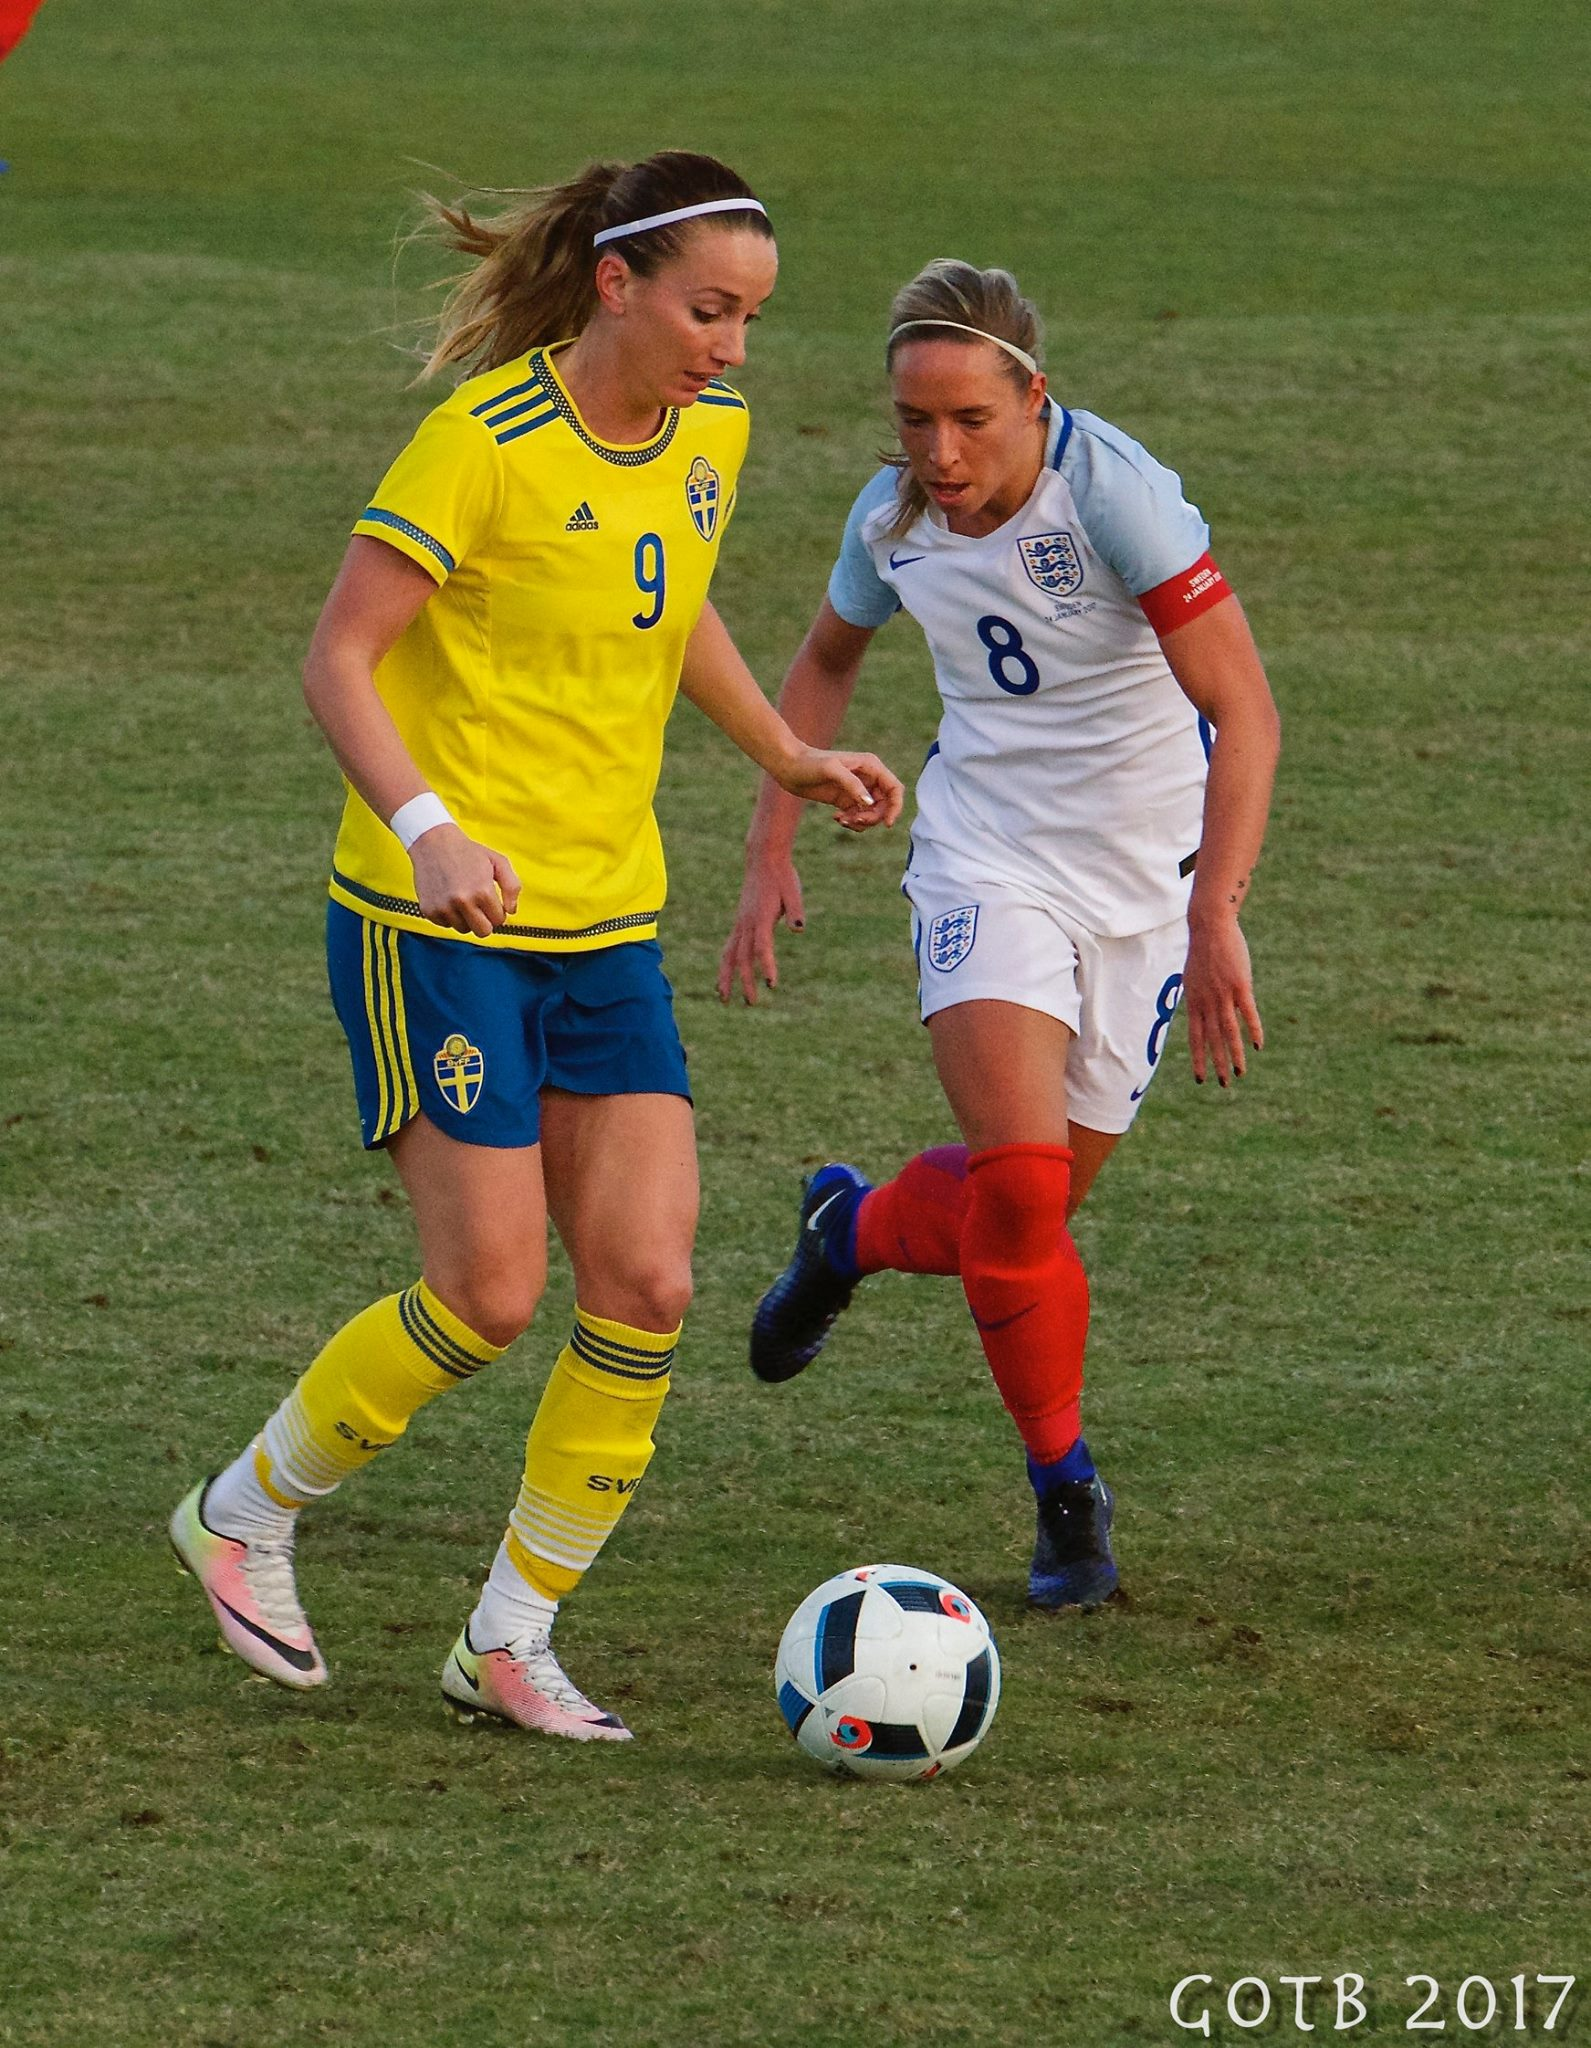 England v Sweden, La Manga